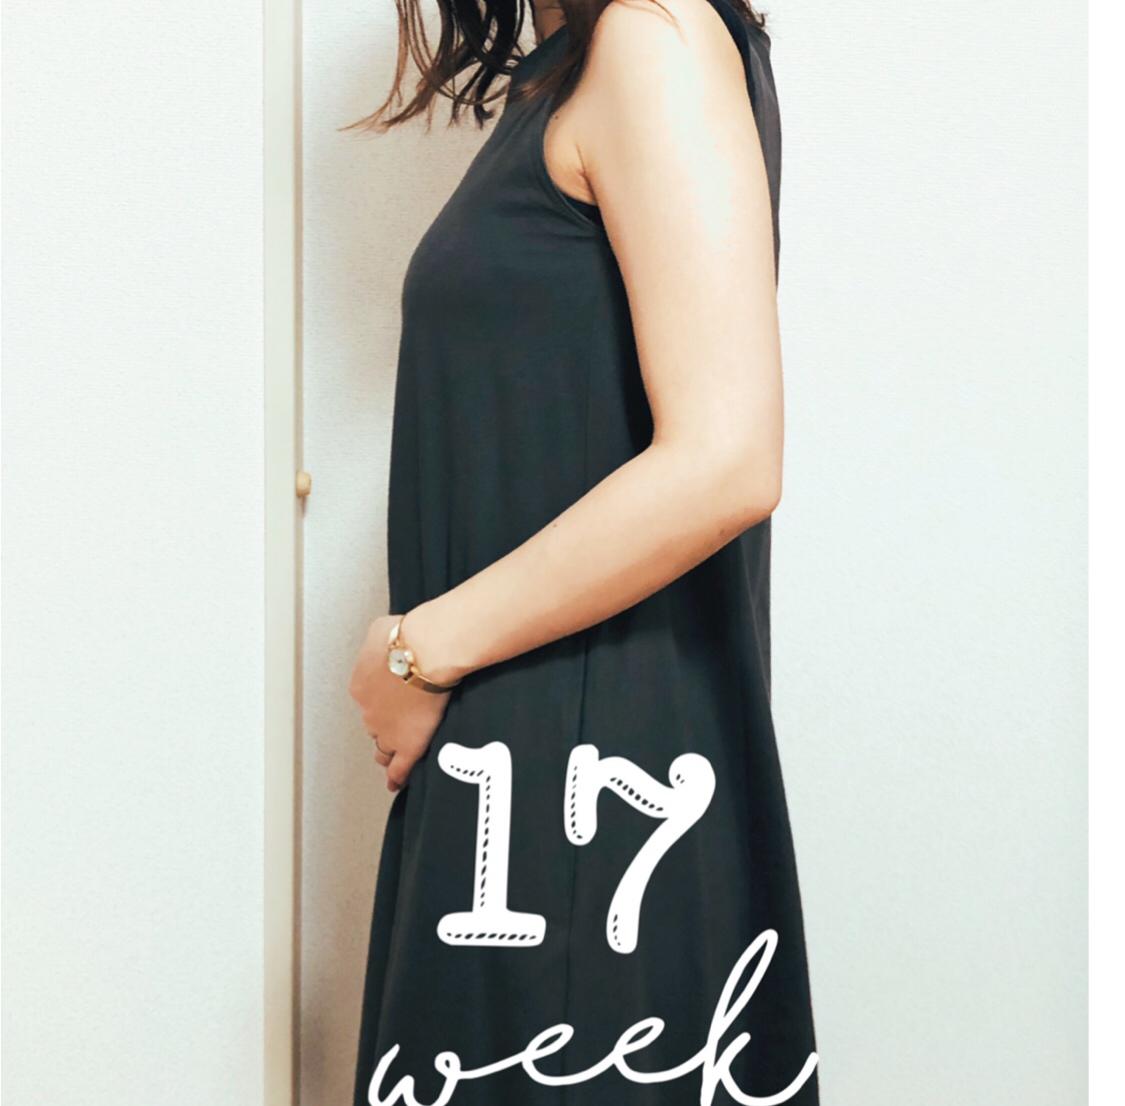 妊娠 5 カ月 お腹